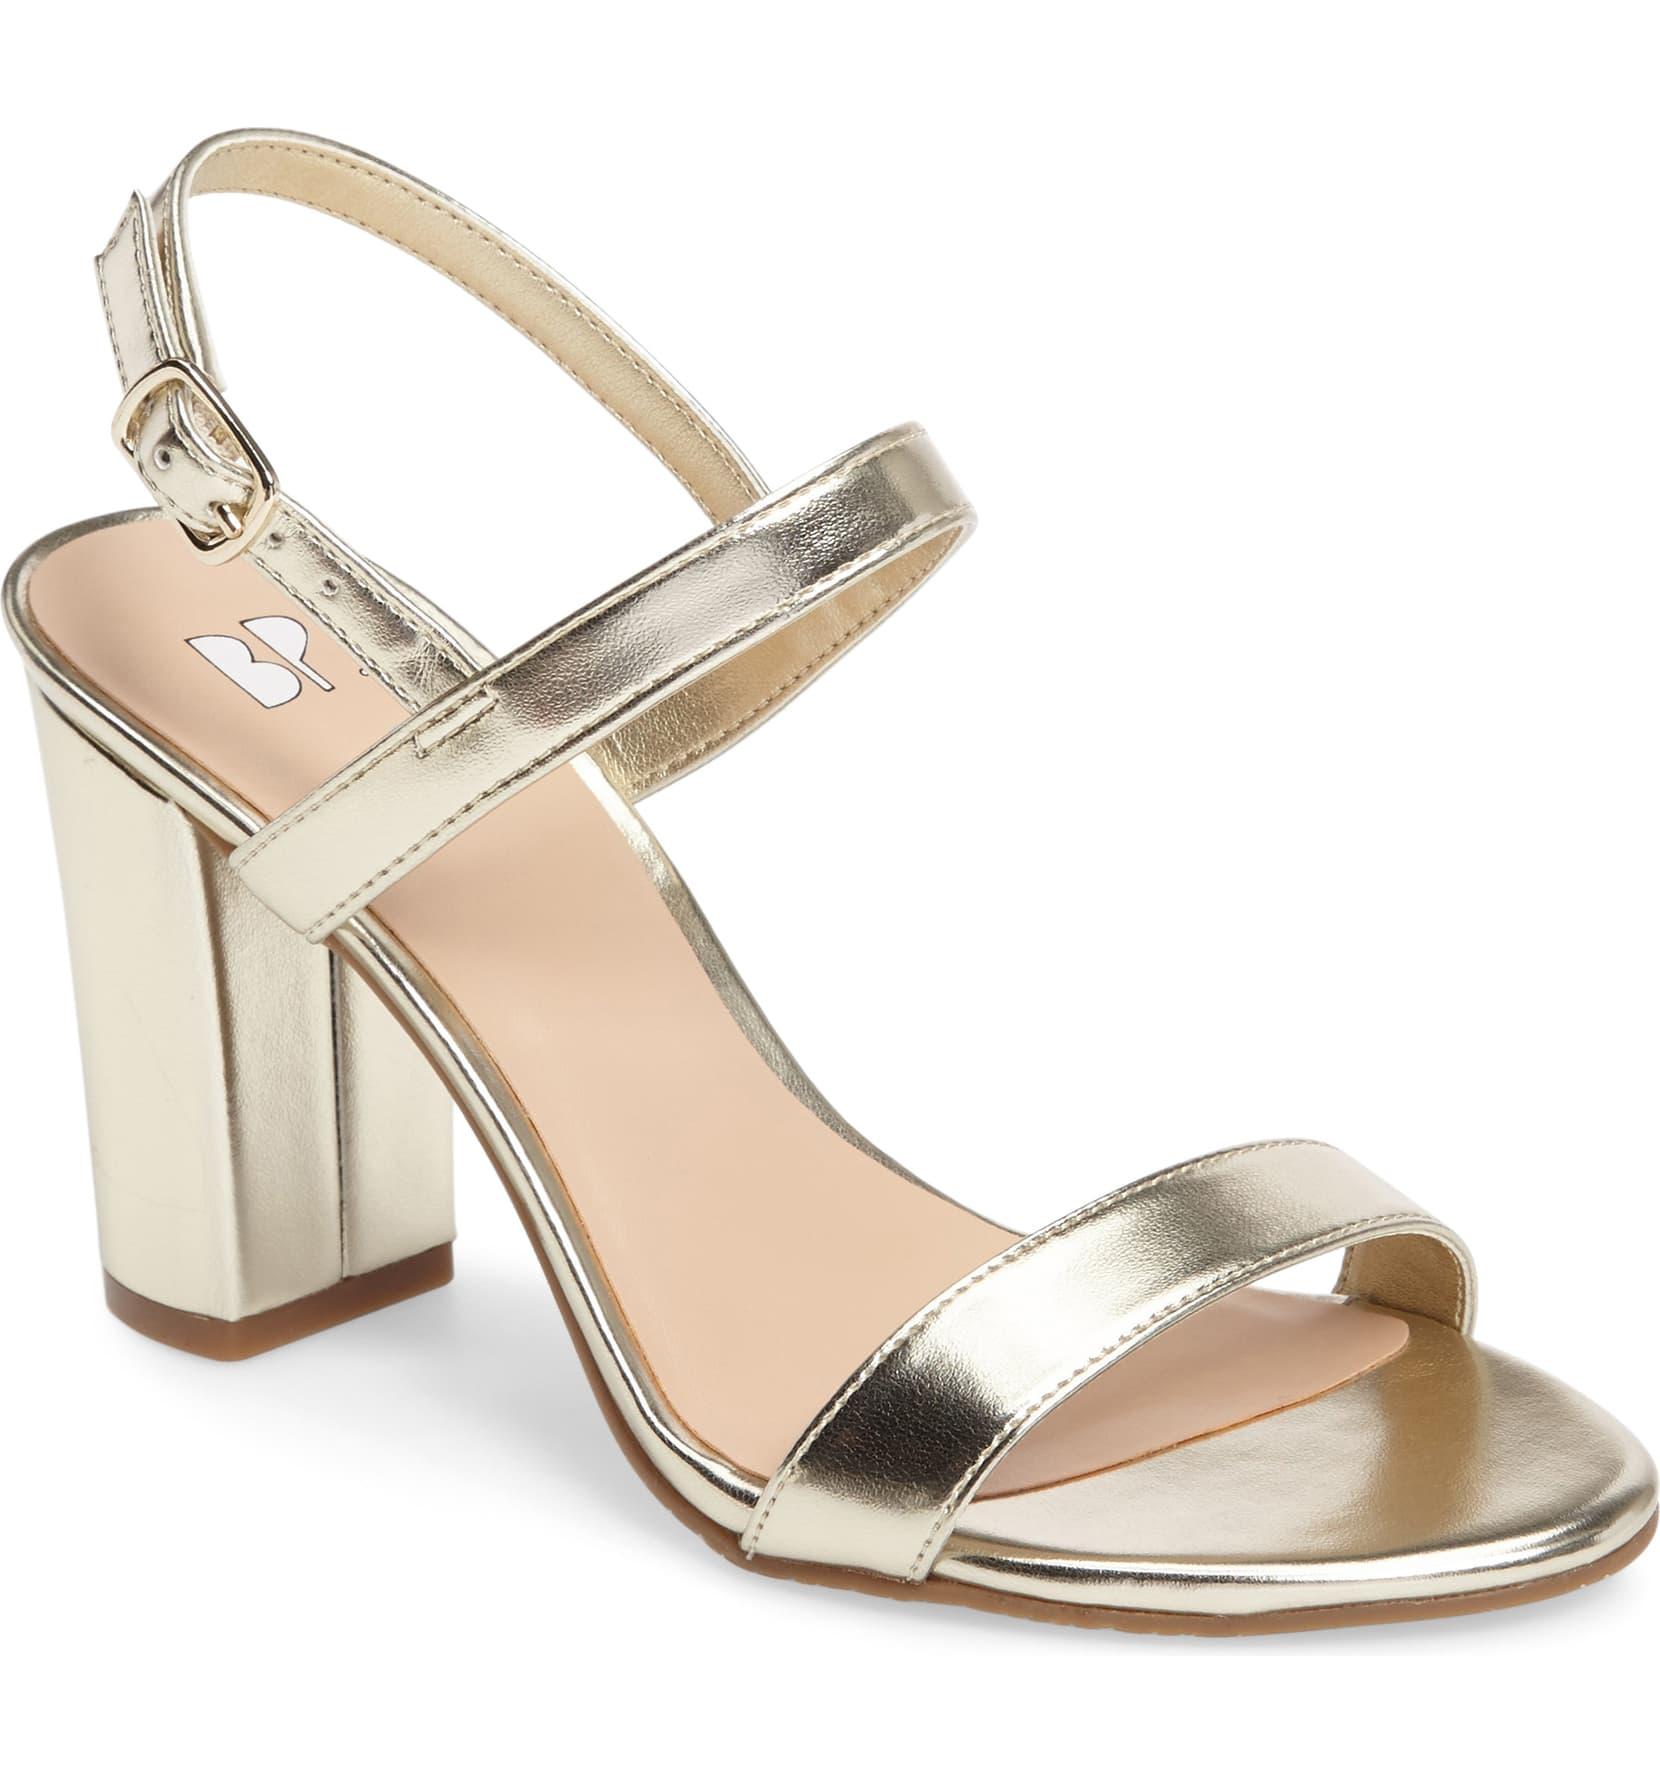 BP Gold sandals